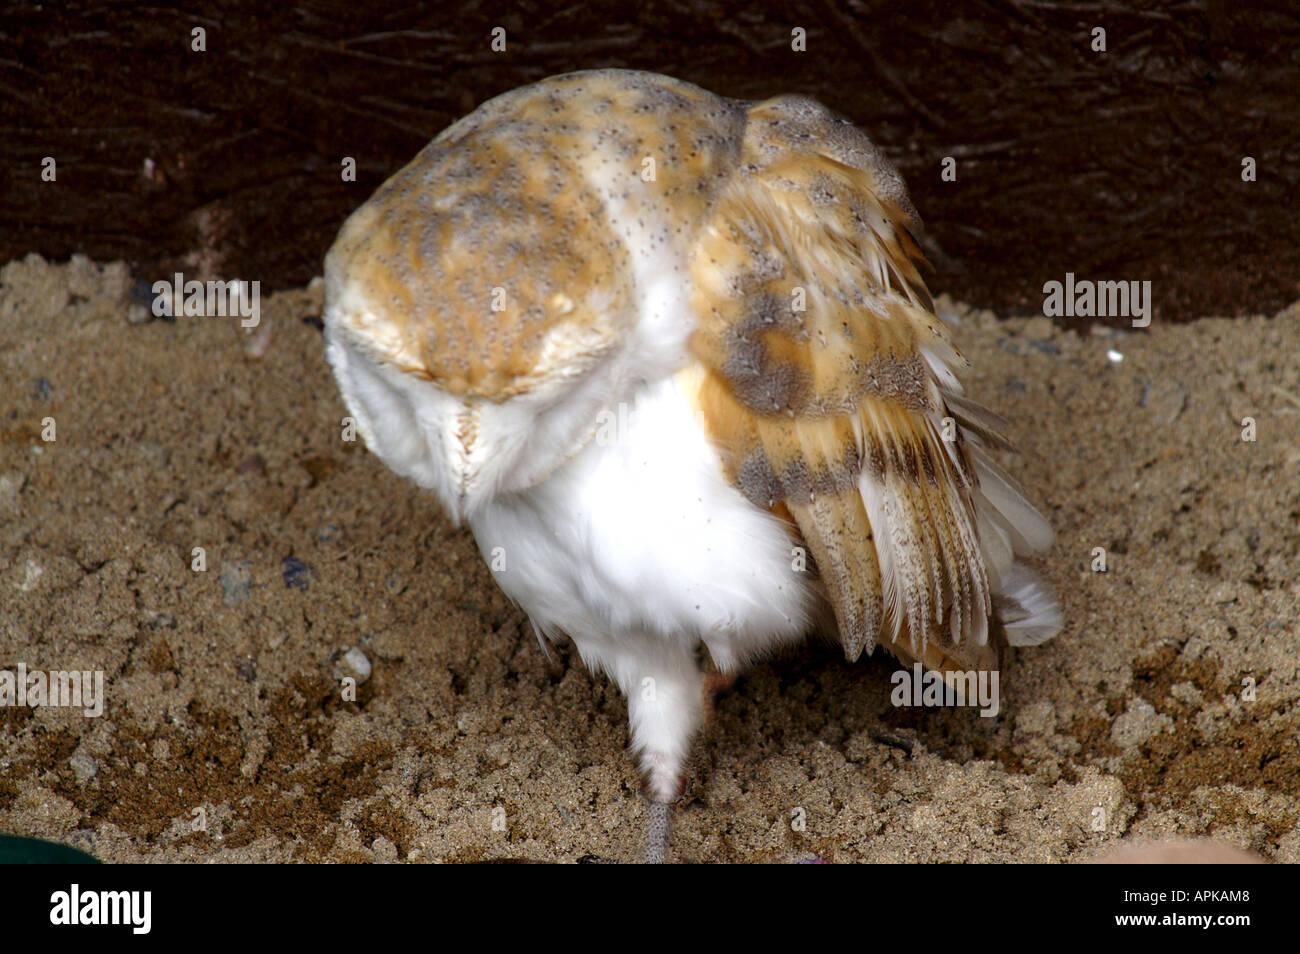 Barn Owl Beak Open Stock Photos & Barn Owl Beak Open Stock Images ...